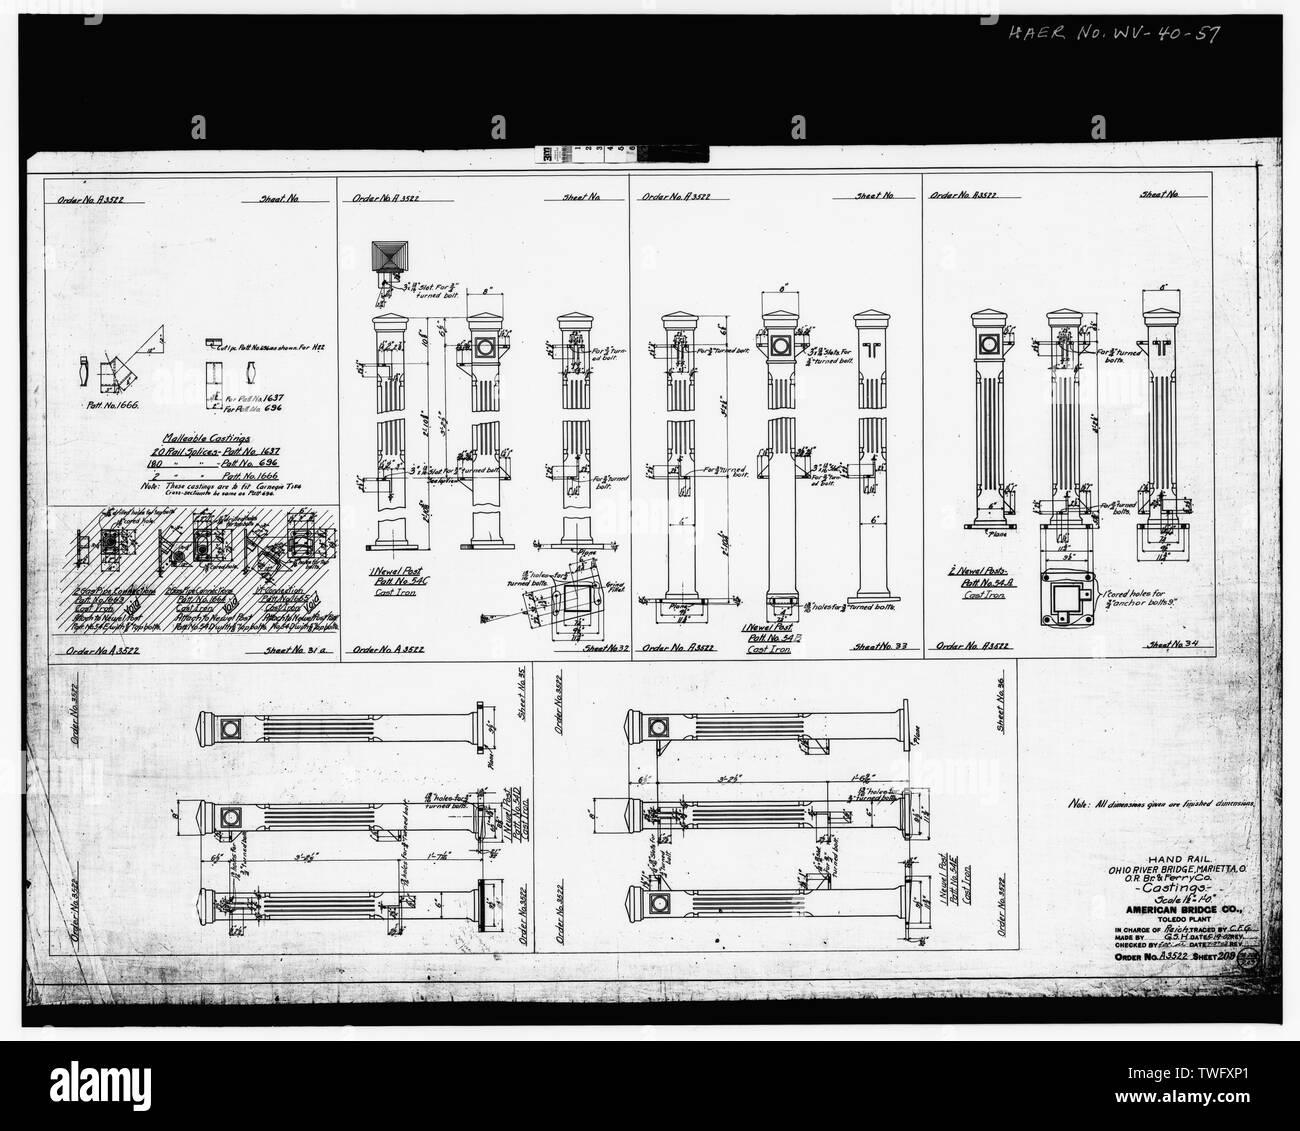 Plan Sheet -209 - Williamstown-Marietta Bridge, Spanning Ohio River between Williamstown and Marietta, Williamstown, Wood County, WV; American Bridge Company; Strobel, Charles L; Ripley, T M - Stock Image